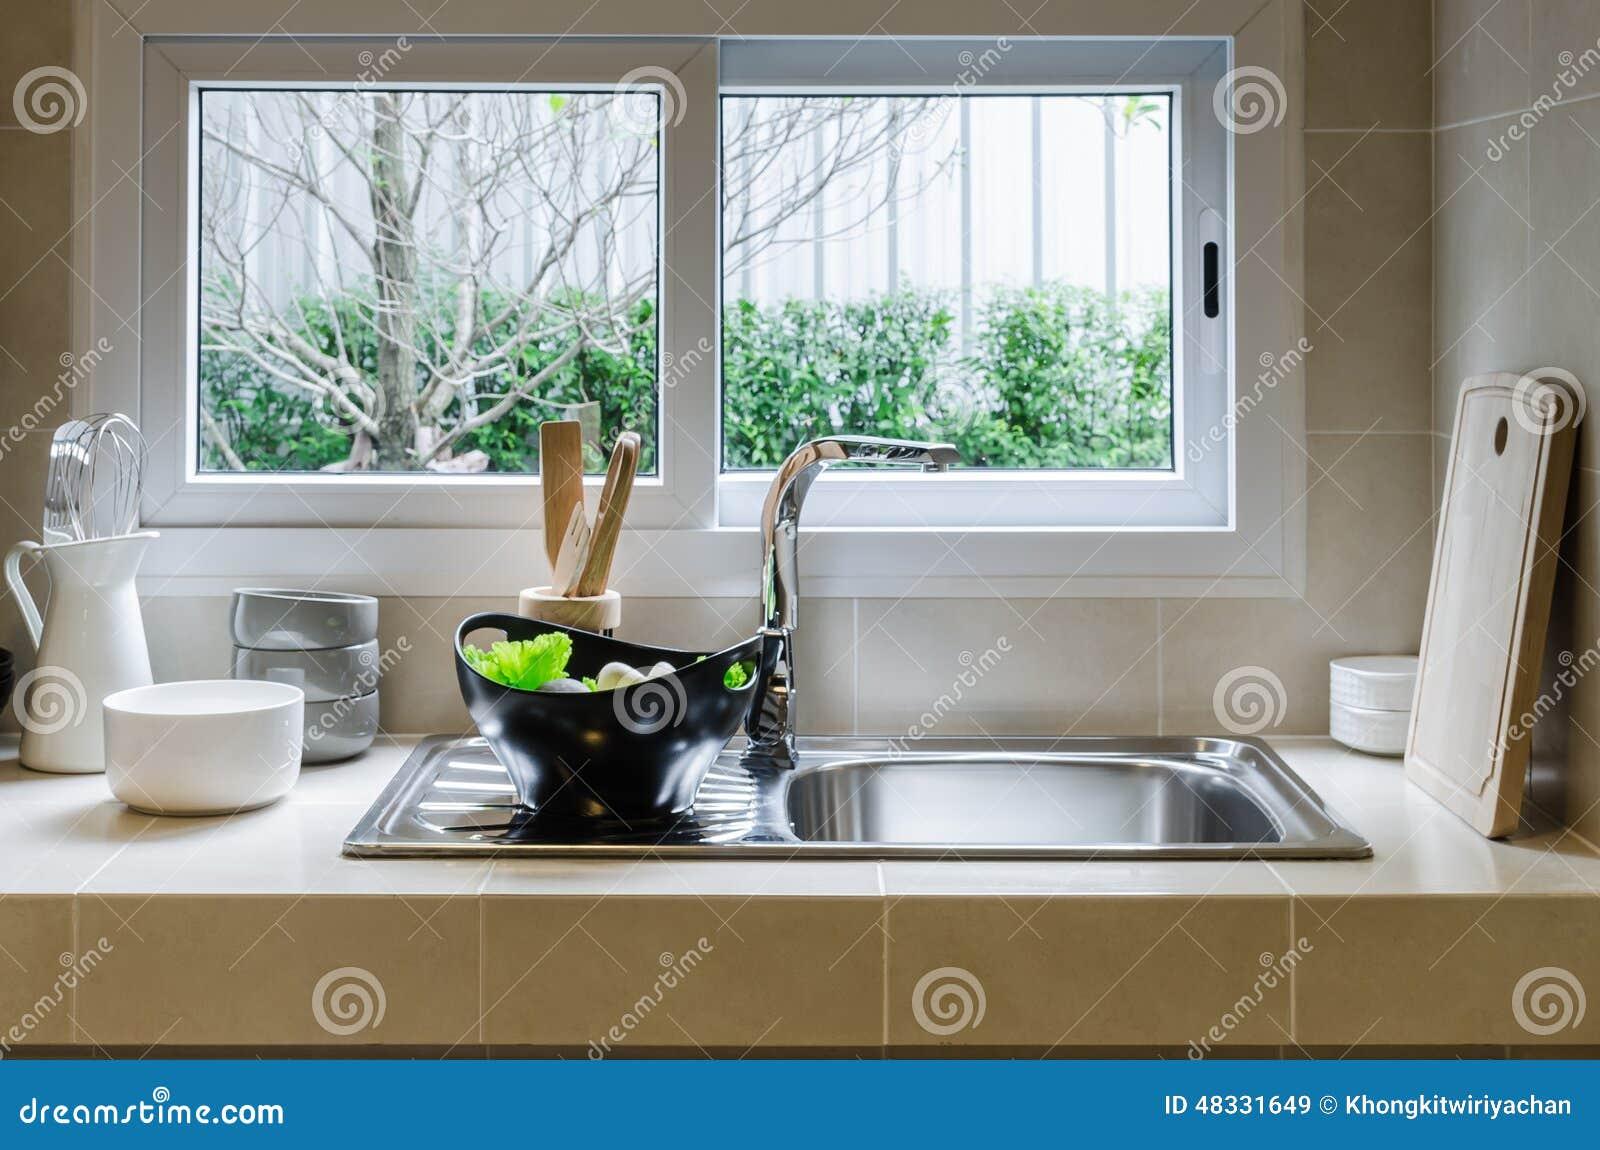 Cucine Con Finestra Sul Lavello sink and counter in kitchen stock image - image of